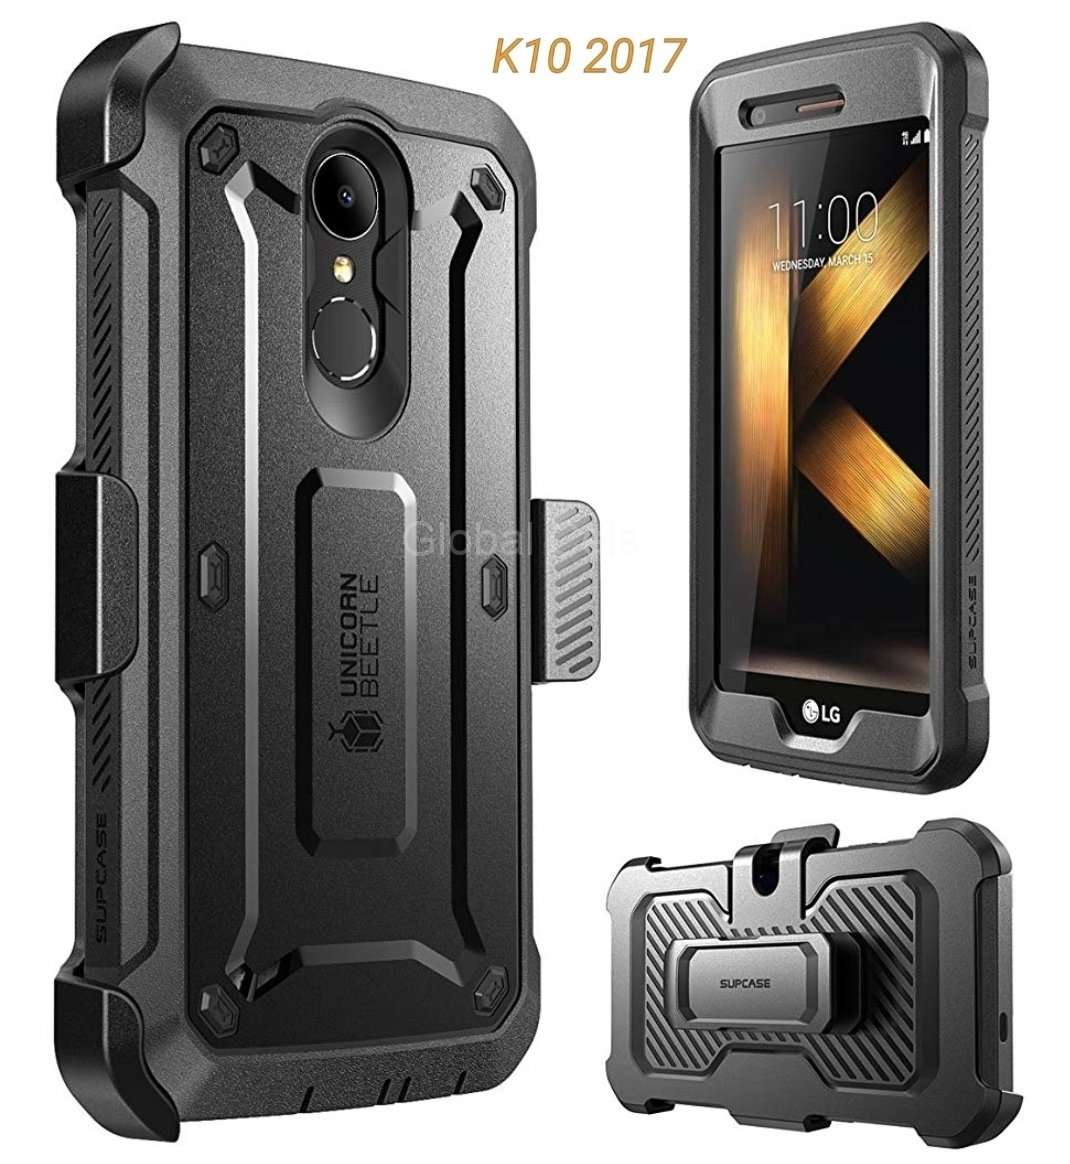 Case Extremo LG K10 2017 Armadura Supcase Pro c/ Gancho